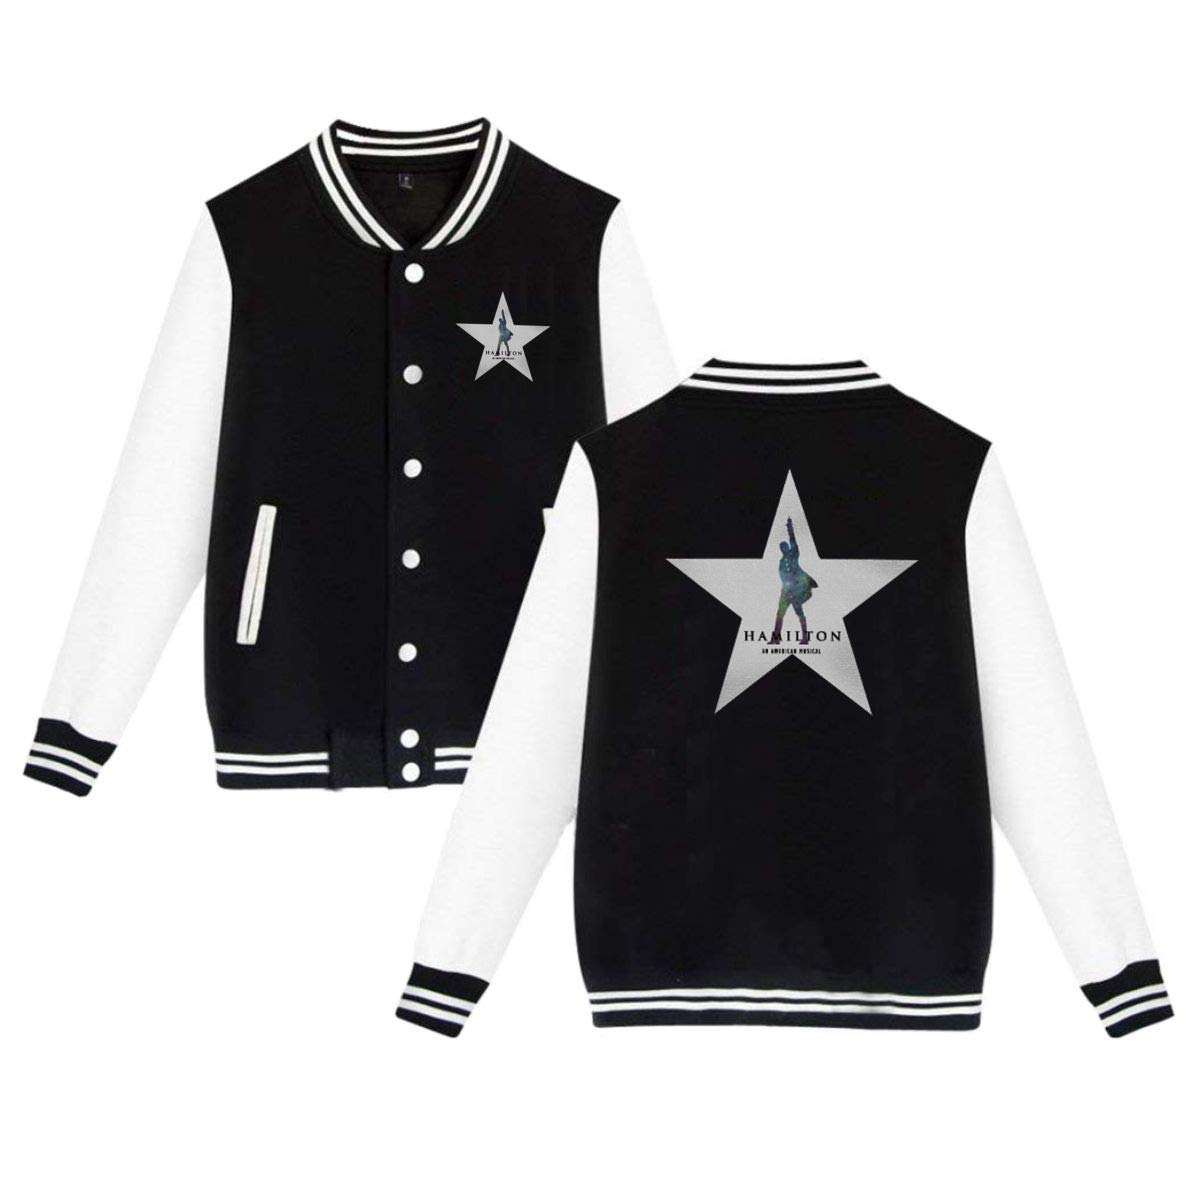 Hamilton Unisex Baseball Jacket Sport Coat Trendy, Soft and Comfortable hfaw